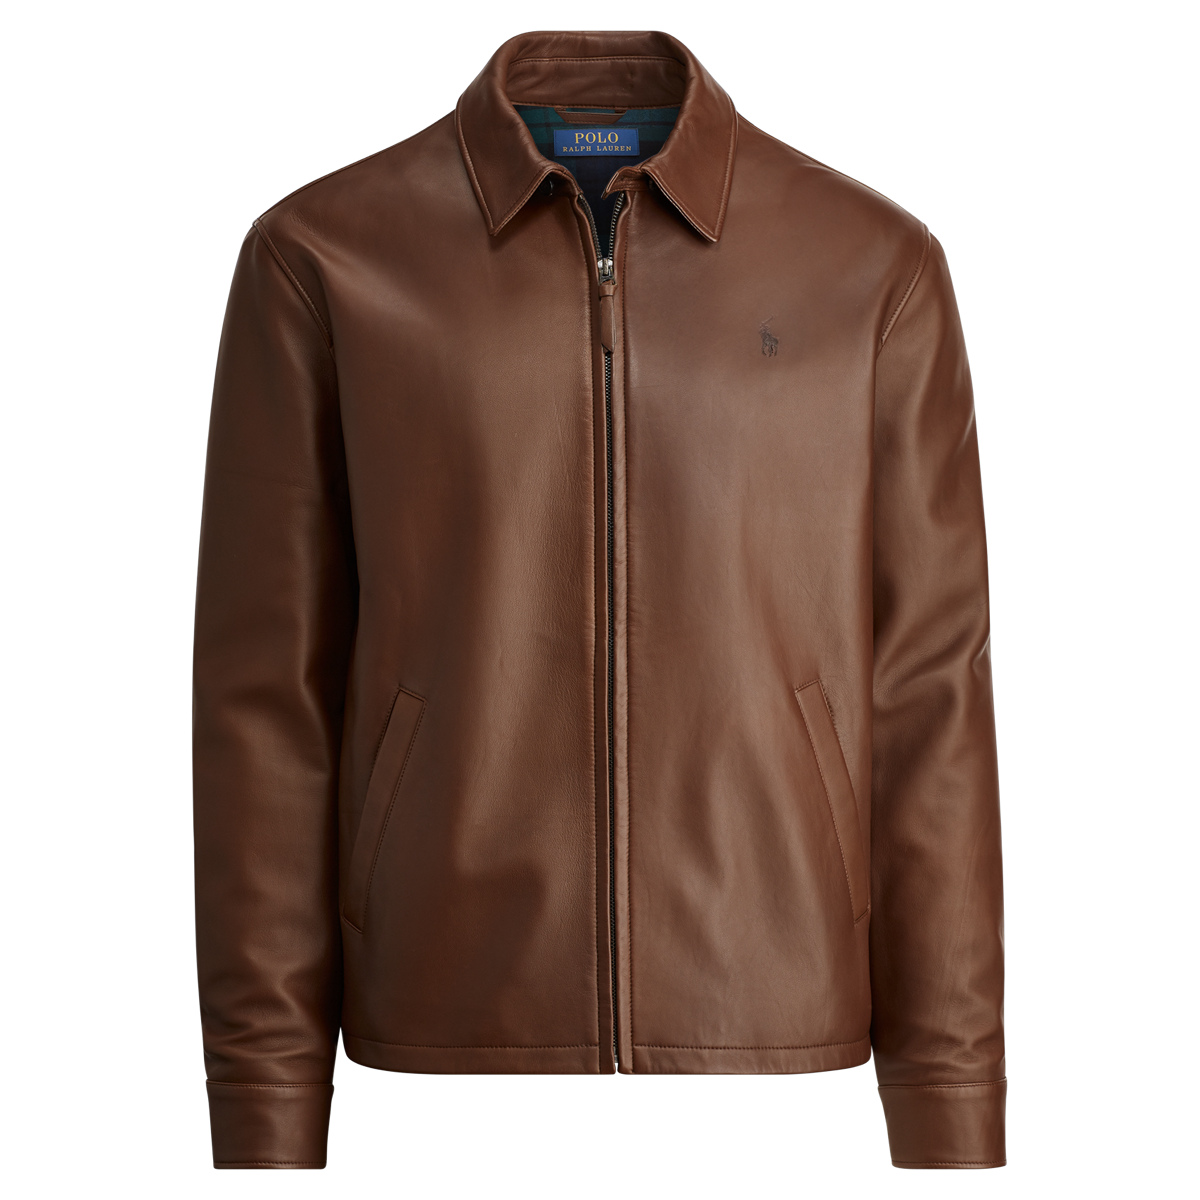 Pin By Brian Scott On Style In 2020 Ralph Lauren Leather Jacket Lambskin Jacket Ralph Lauren Leather [ 1200 x 1200 Pixel ]